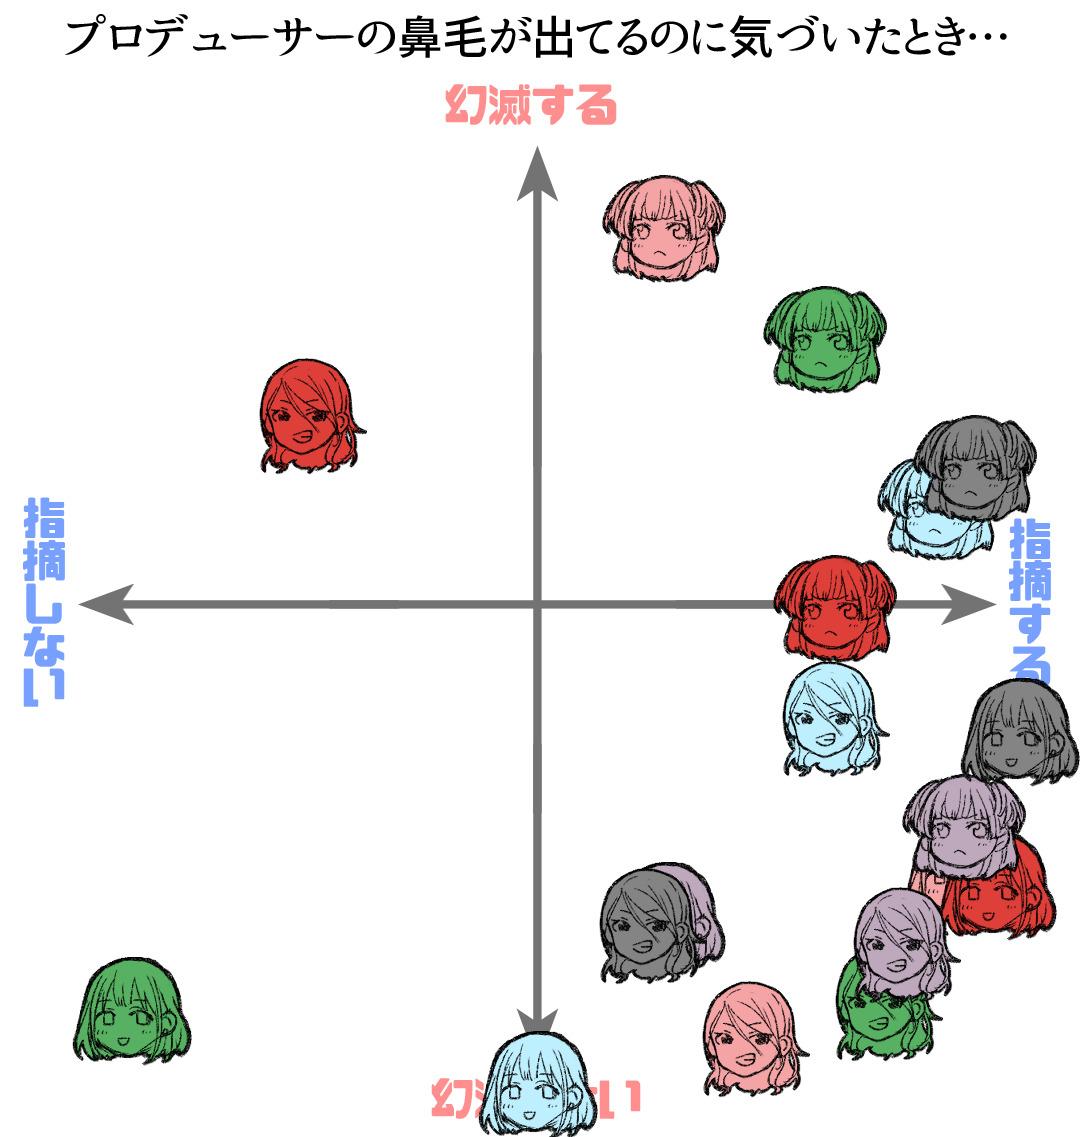 f:id:hoshi_sano:20200414113945j:image:w400